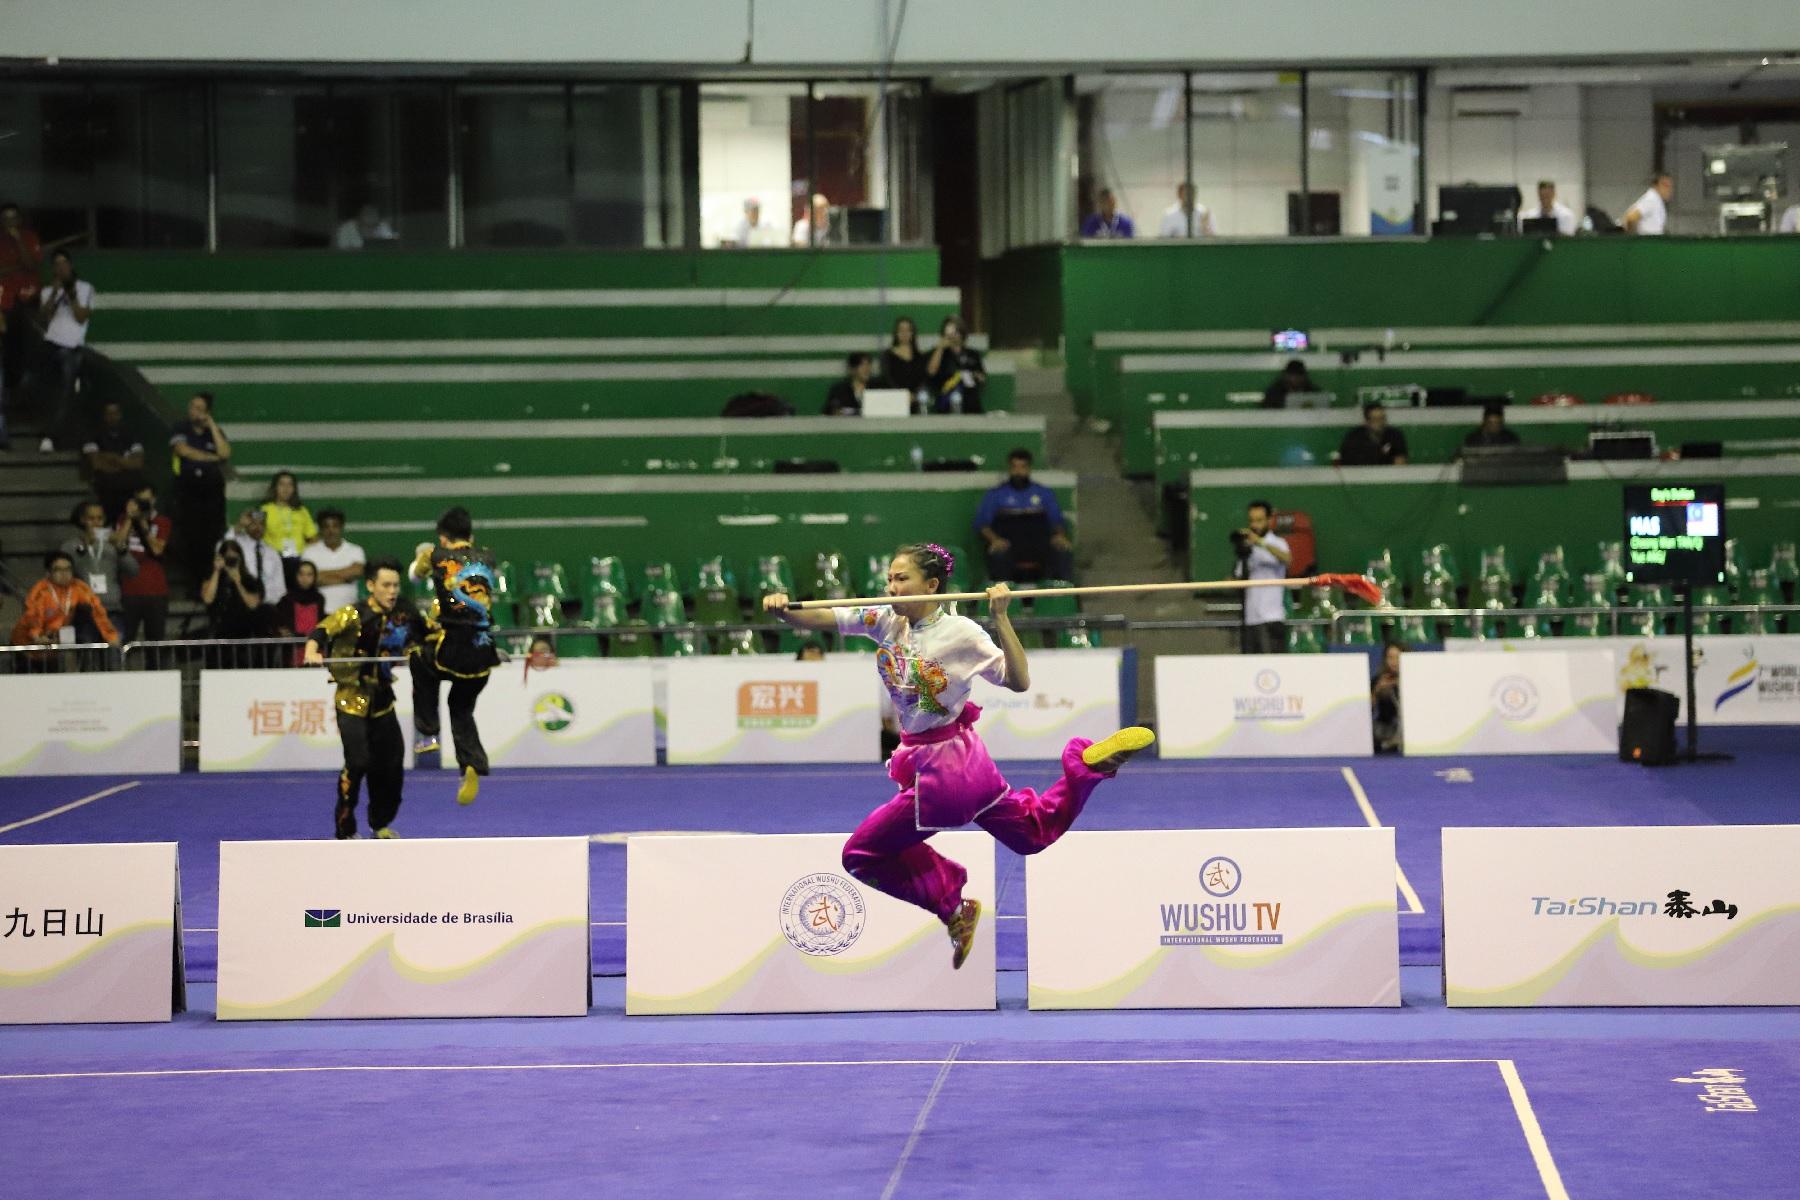 wayland-li-wushu-brazil-world-junior-wushu-championships-2018-team-canada-34.jpg